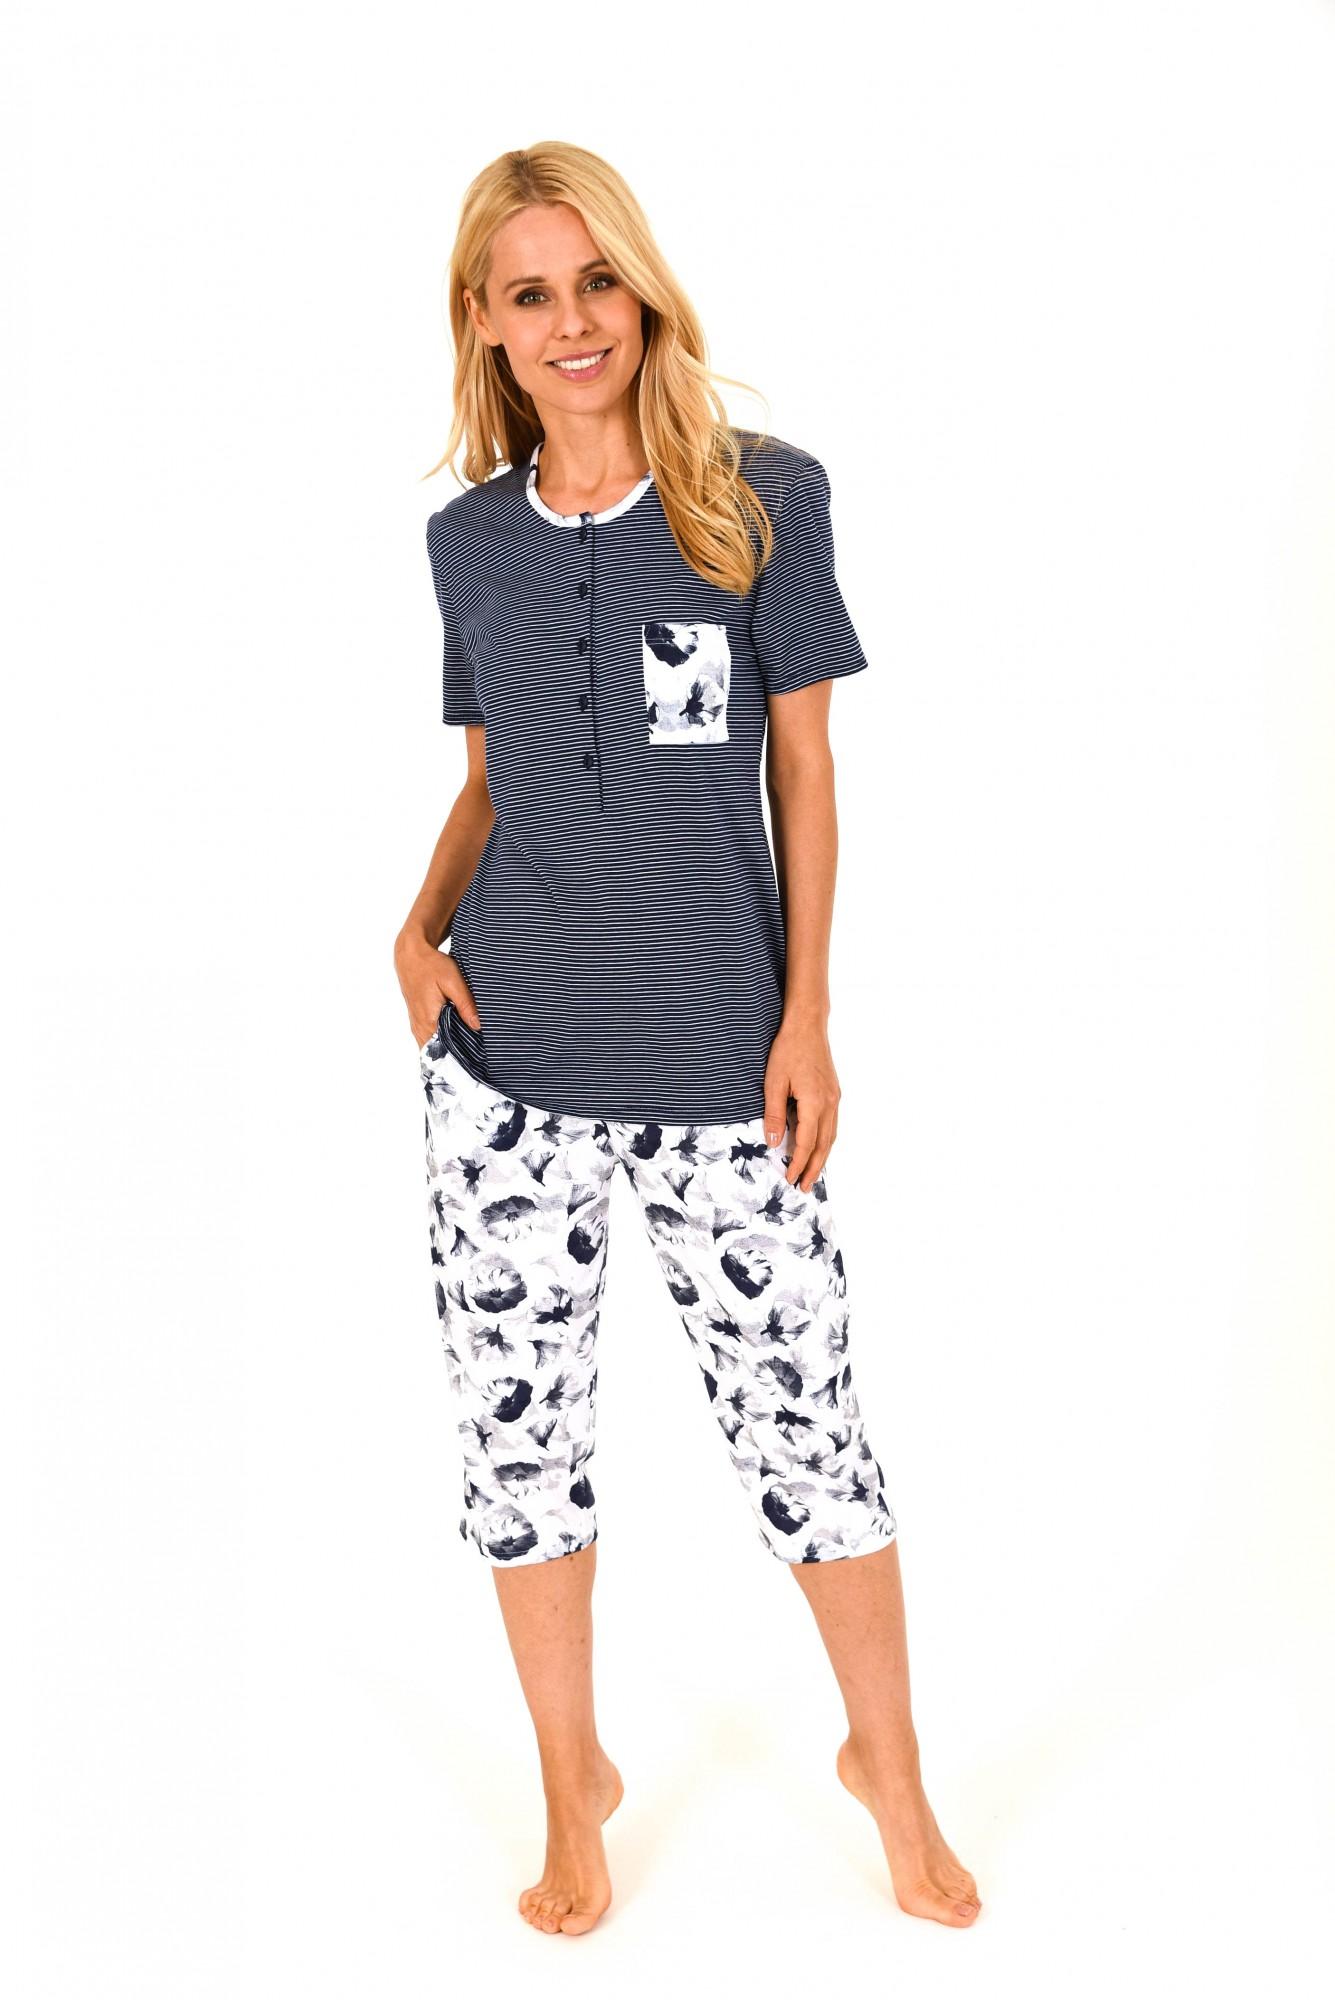 Damen Capri Pyjama kurzarm – tolle Optik – 60756